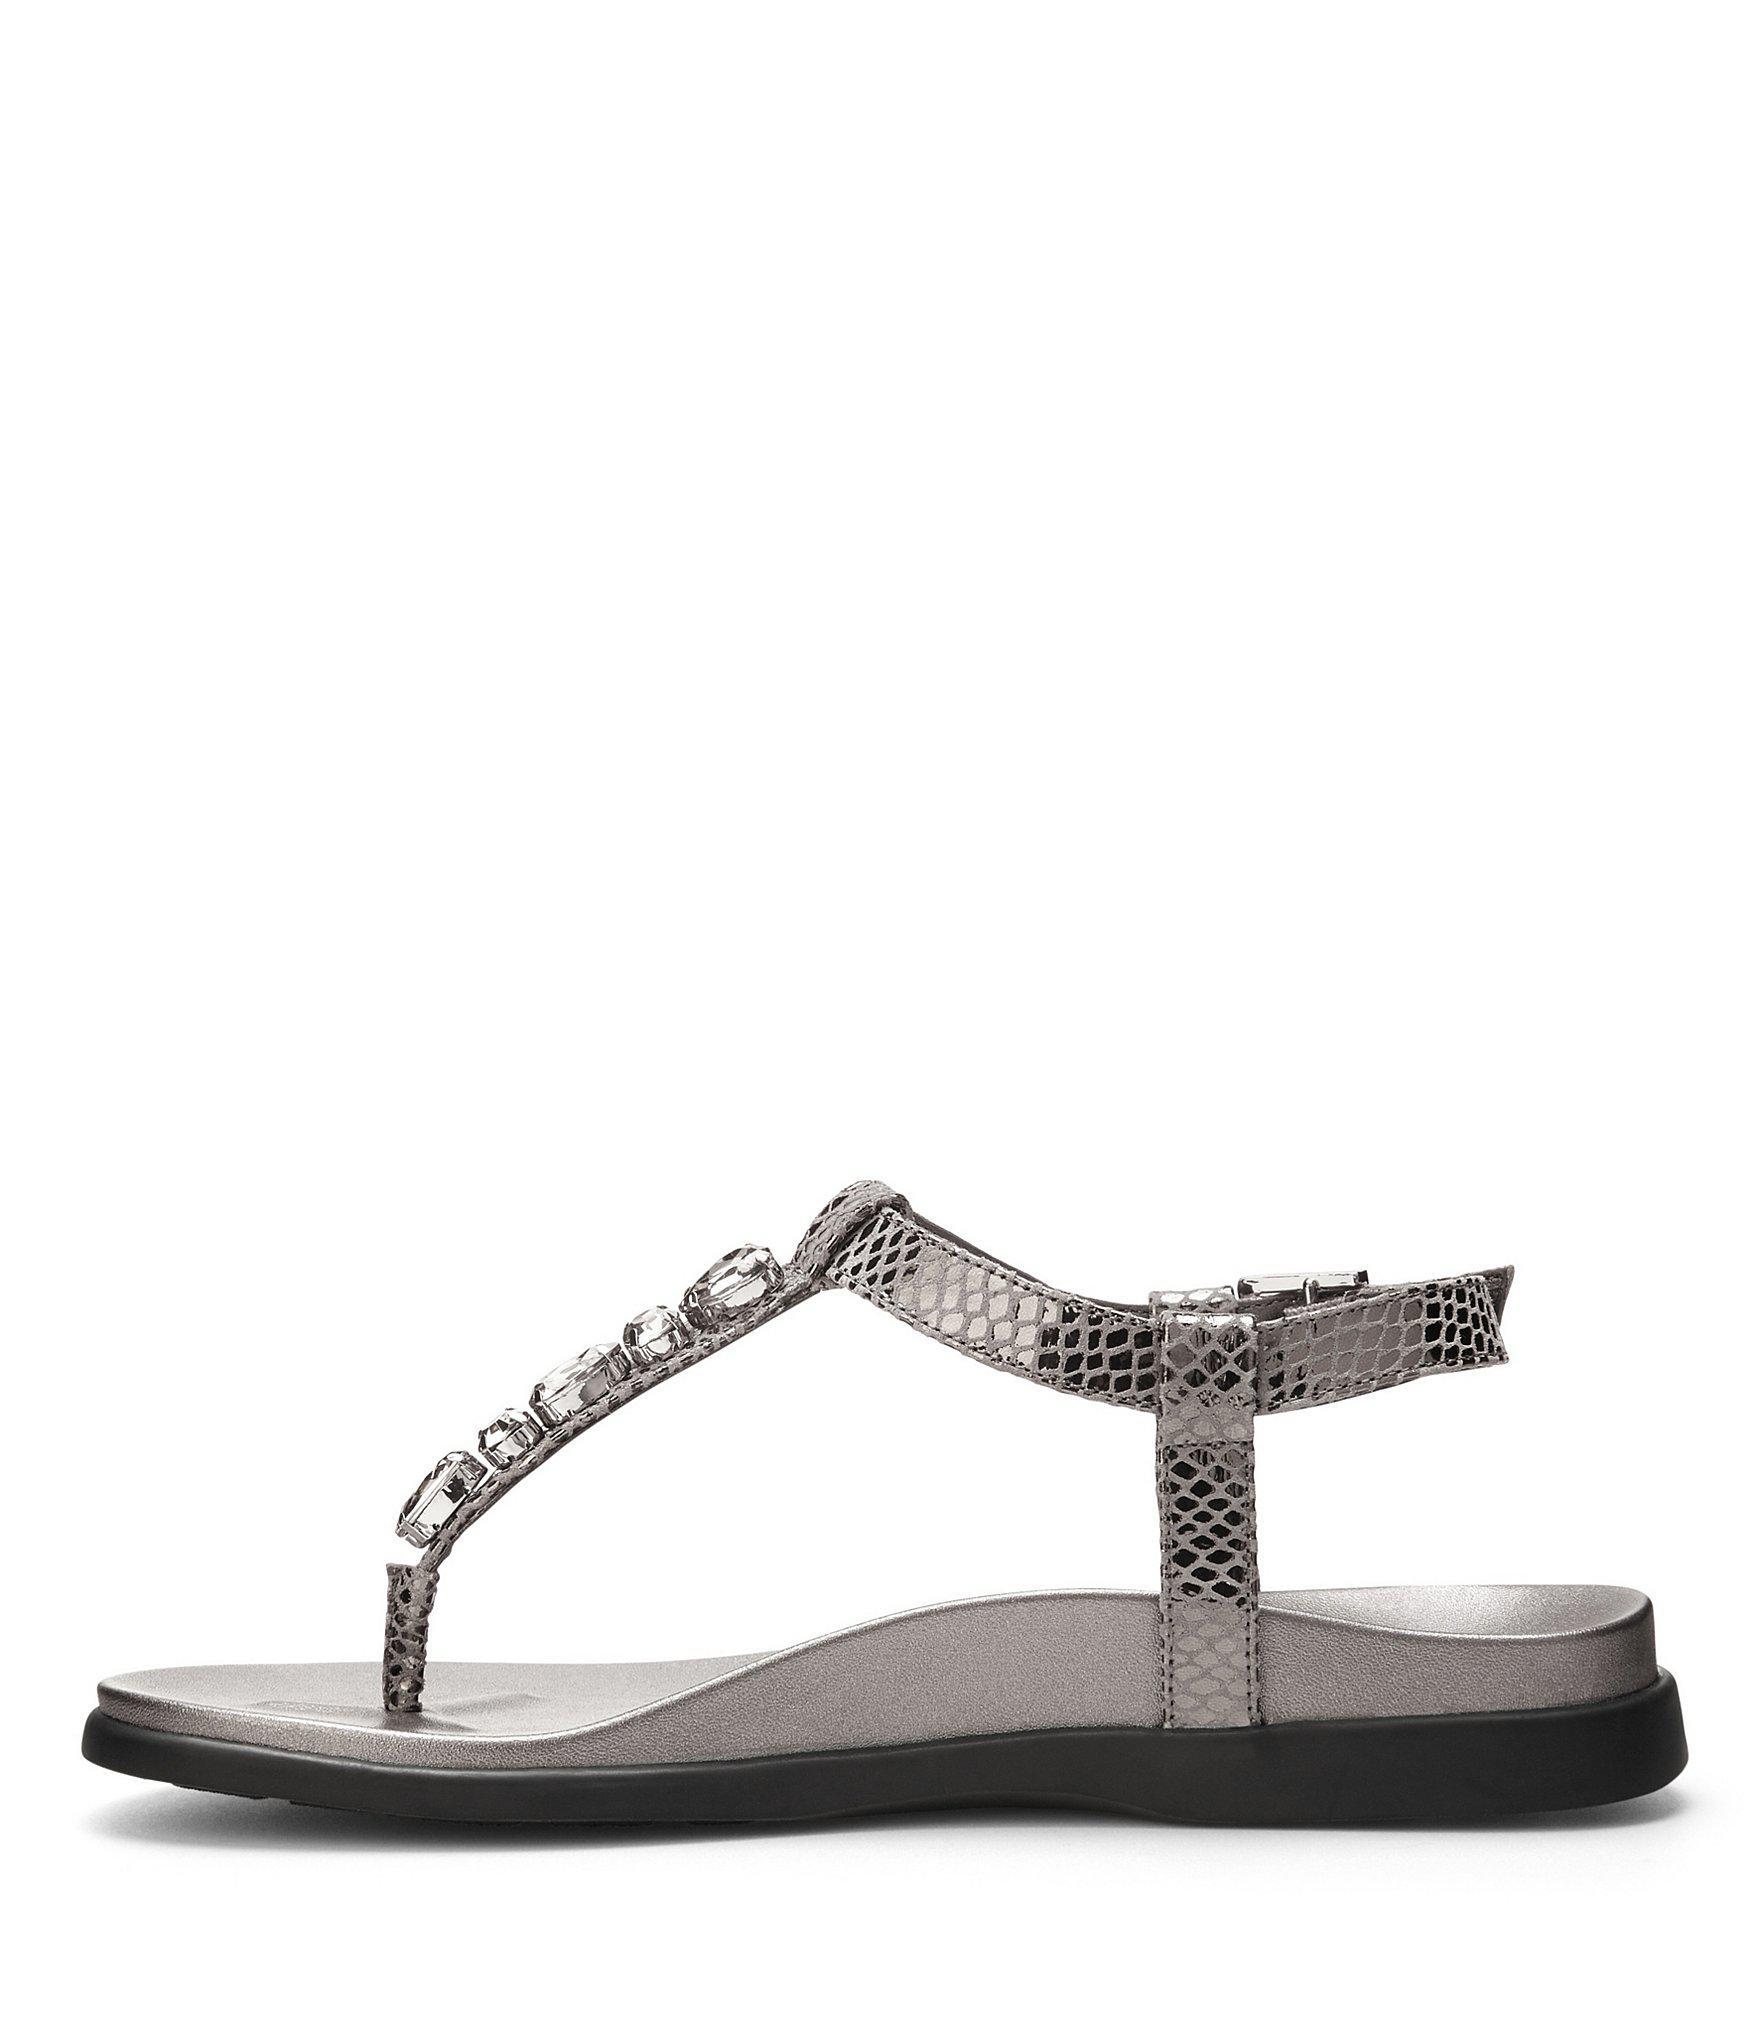 1fa998b91197 Lyst - Vionic Boca Snake Print Gemstone Studded Thong Sandals